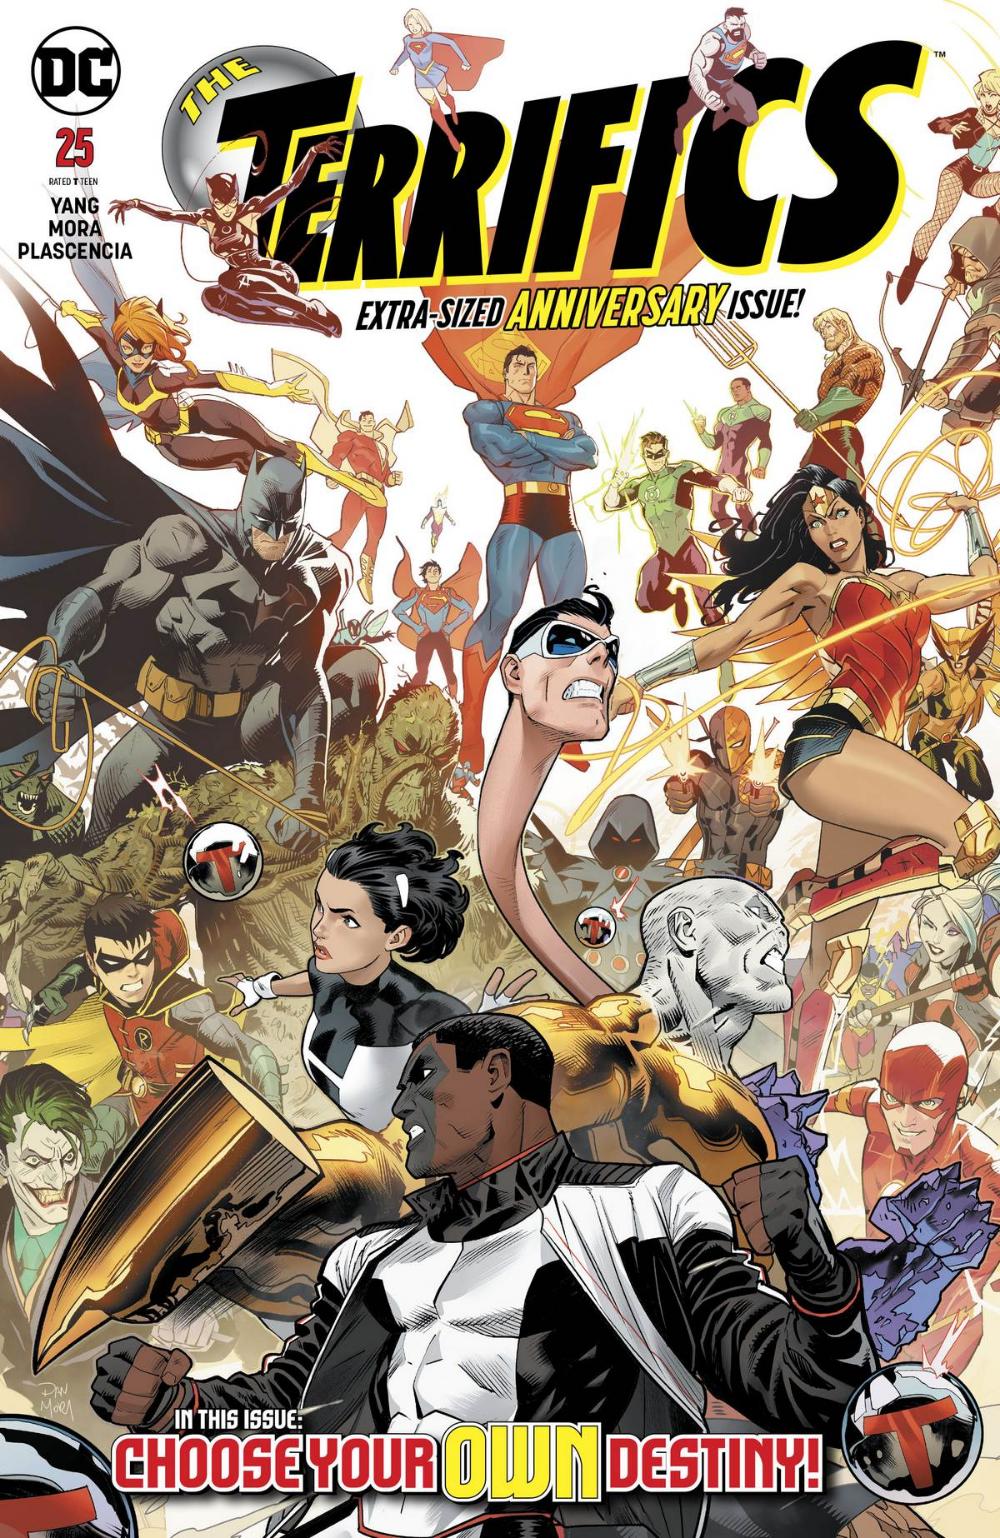 Read The Terrifics 2018 Issue 25 Page 1 Online Comicpunch Net In 2020 Comics Dc Comic Books Comic Book List